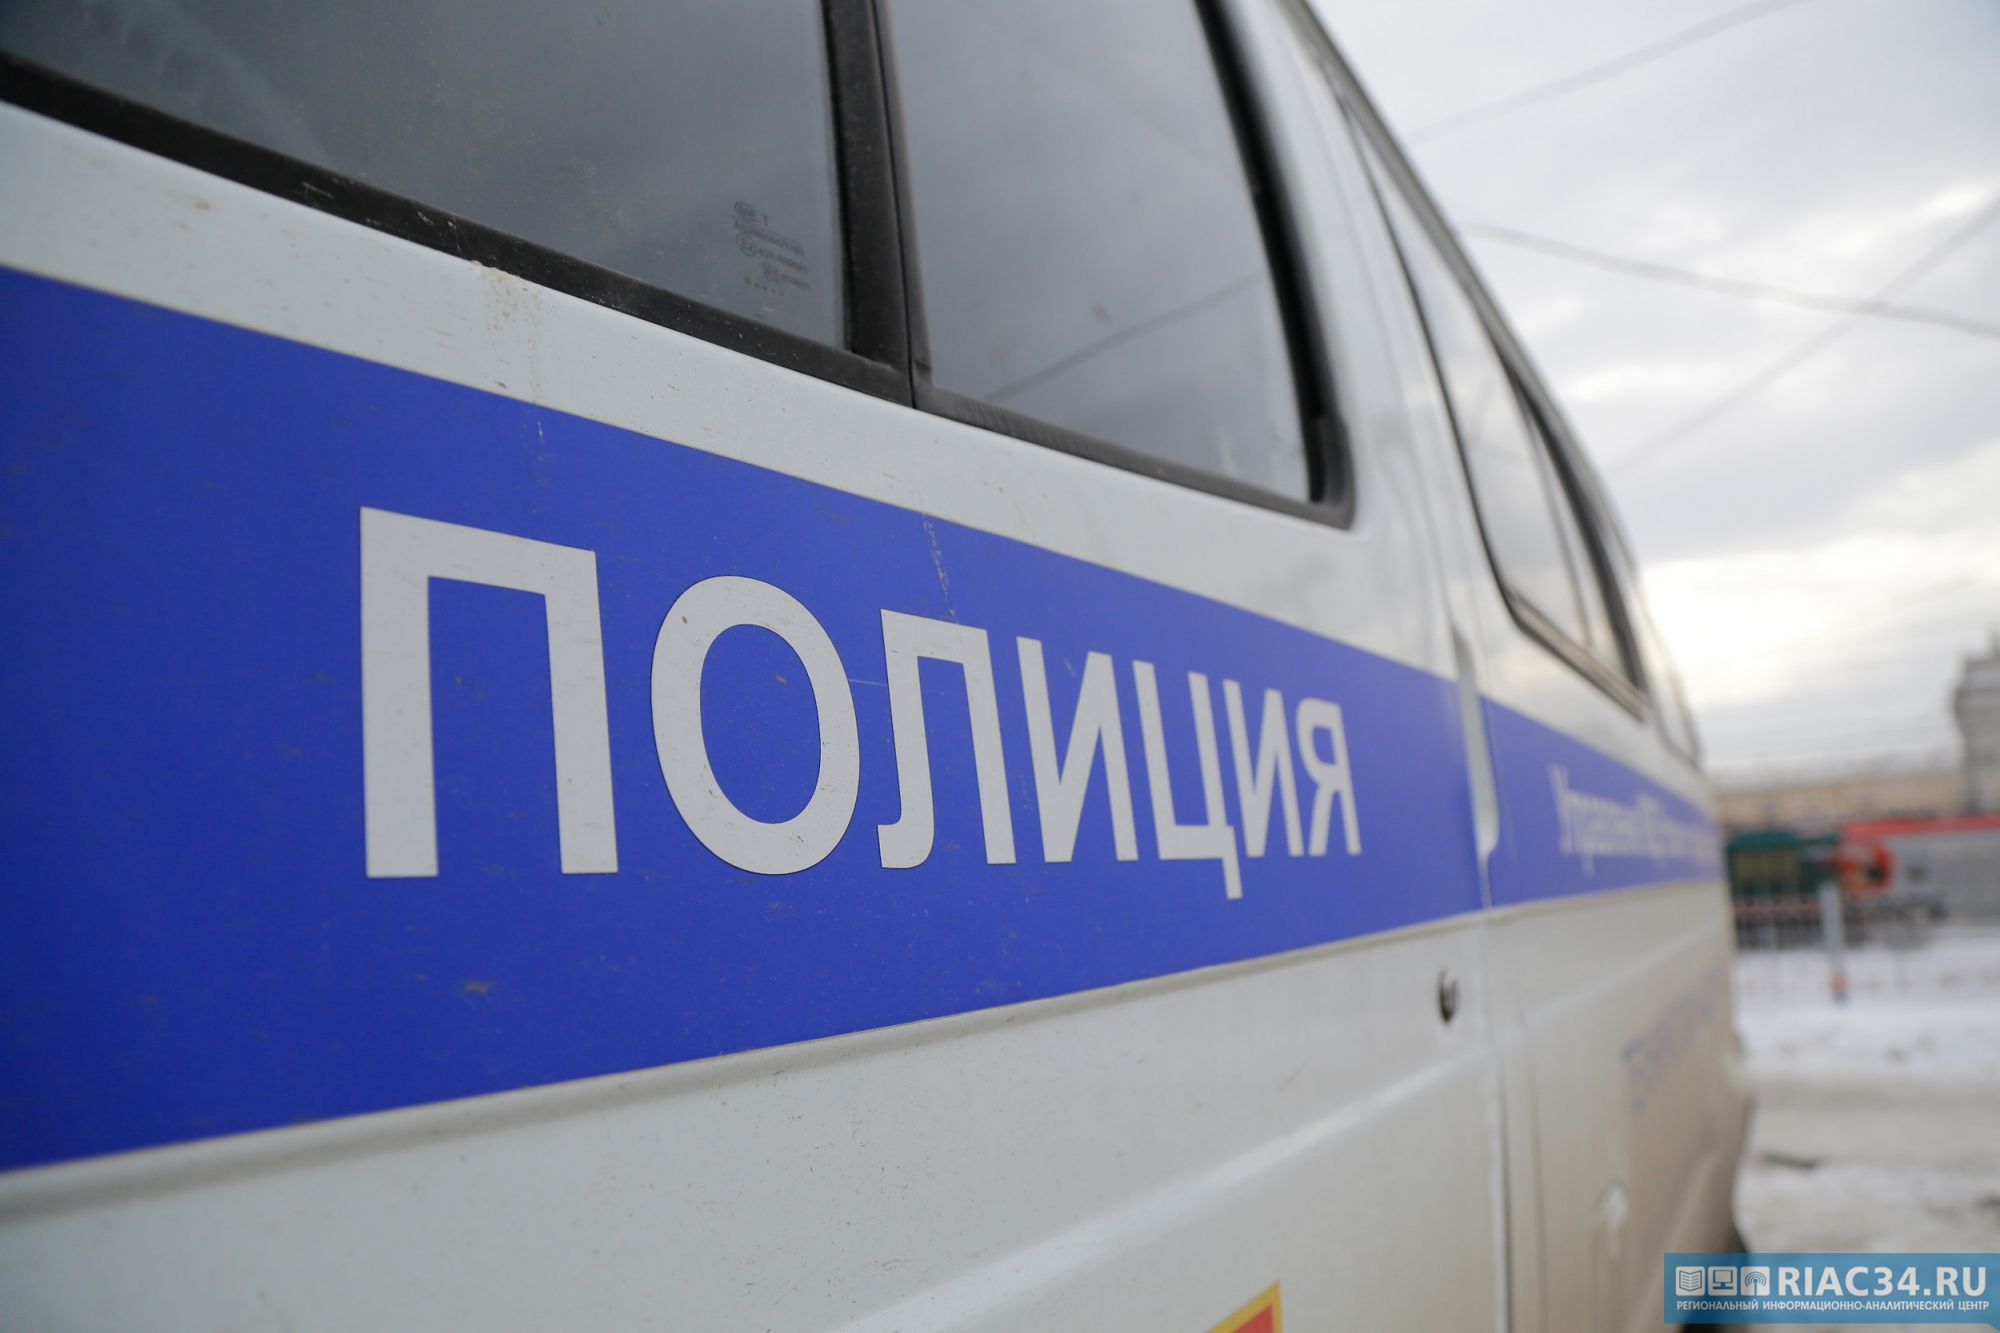 ВВолгограде столкнулись маршрутка иавтобус: пострадала пассажирка